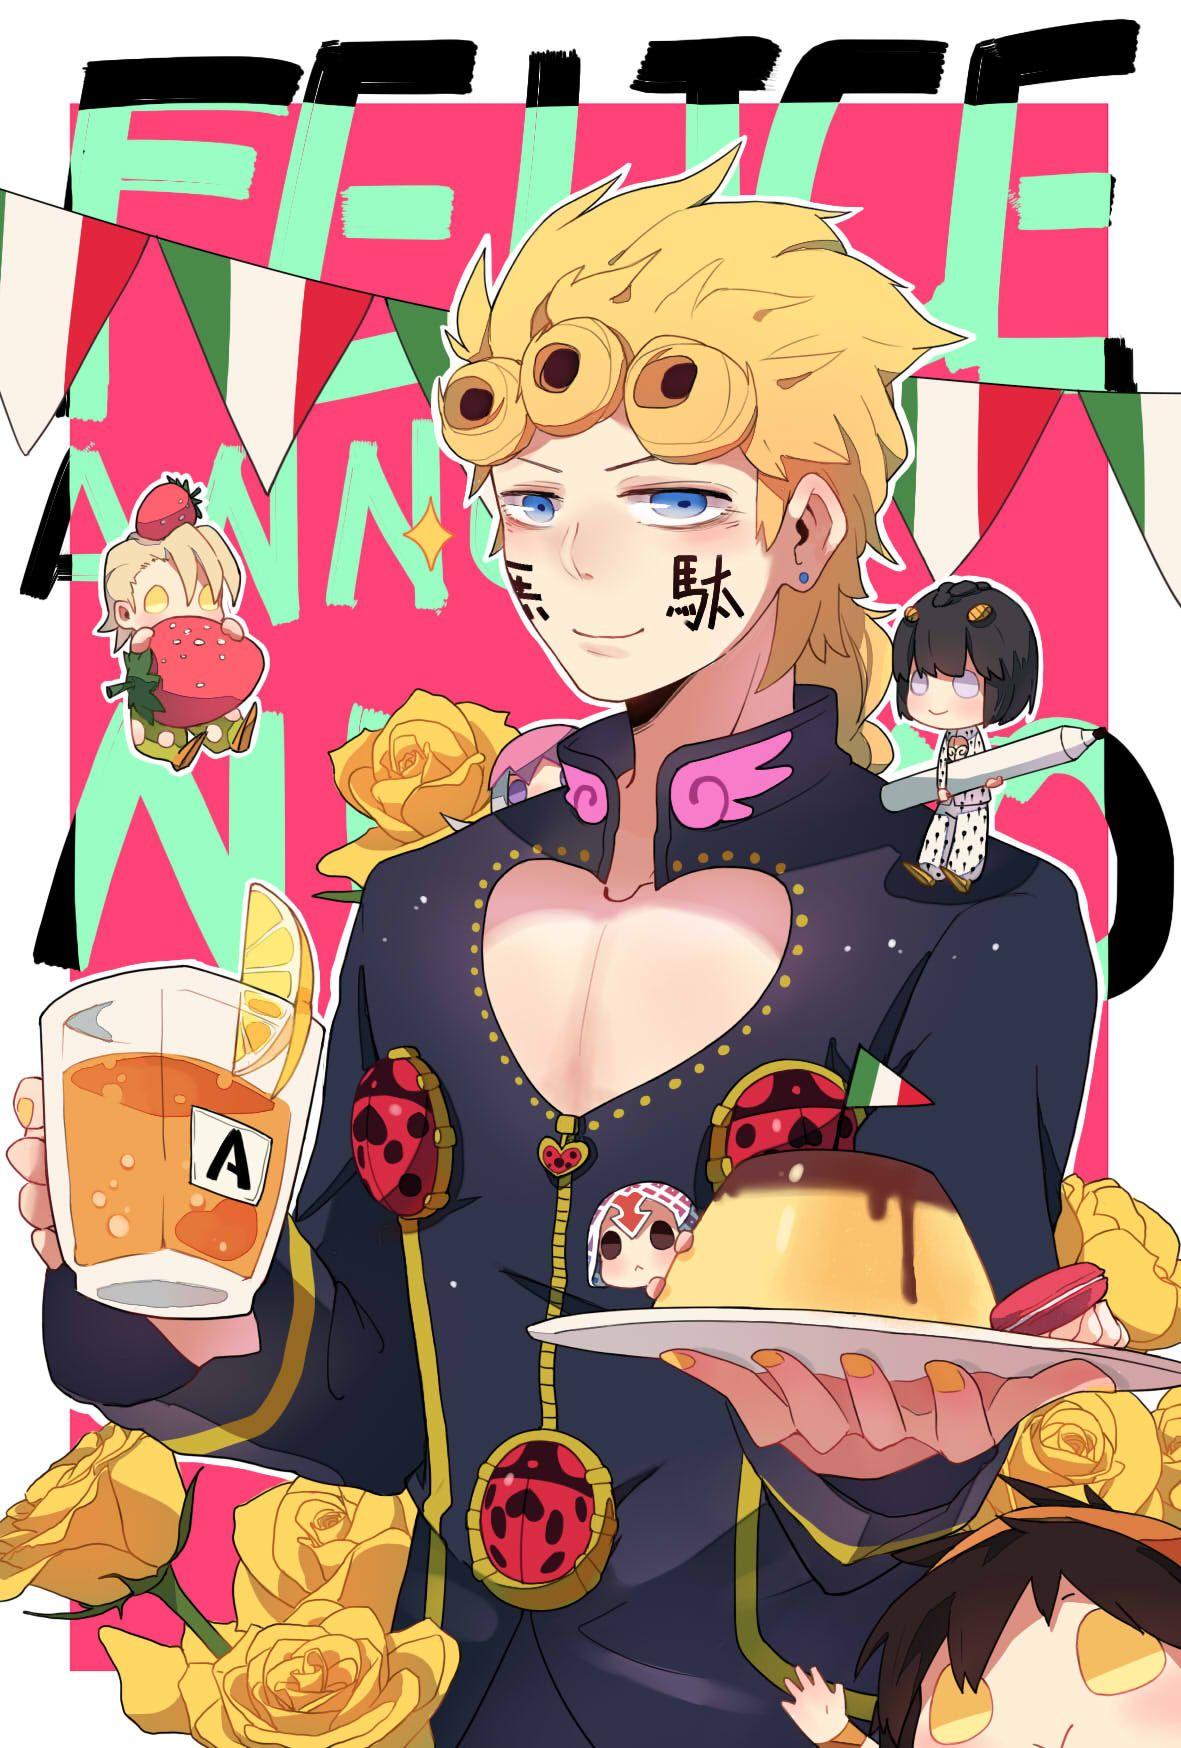 Vento Aureo, by Pixiv Id 7396489 Anime, Fairy tail anime